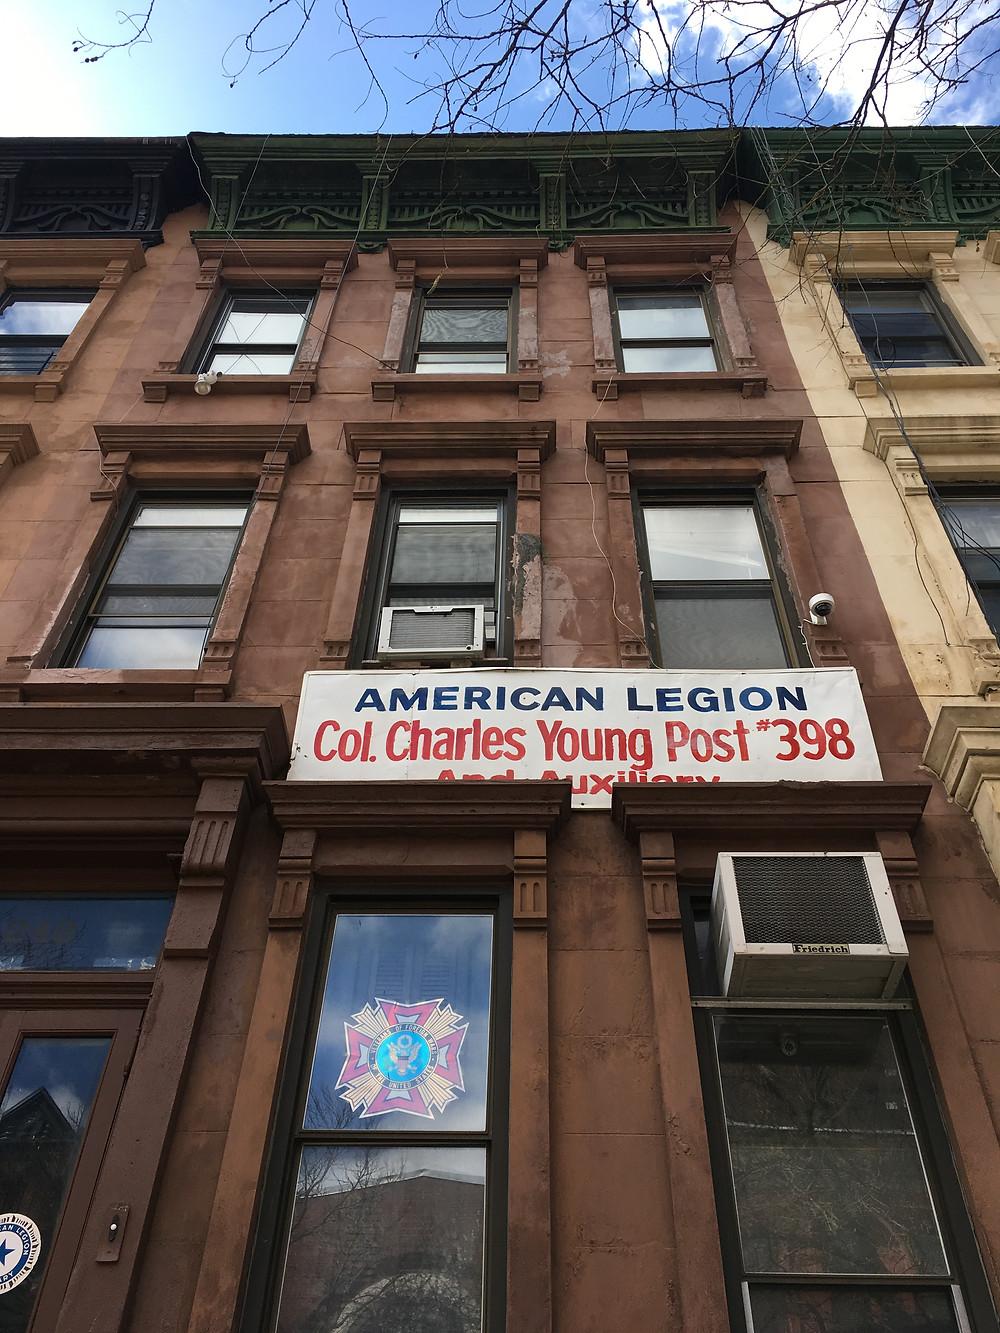 American Legion Post 398 in Harlem